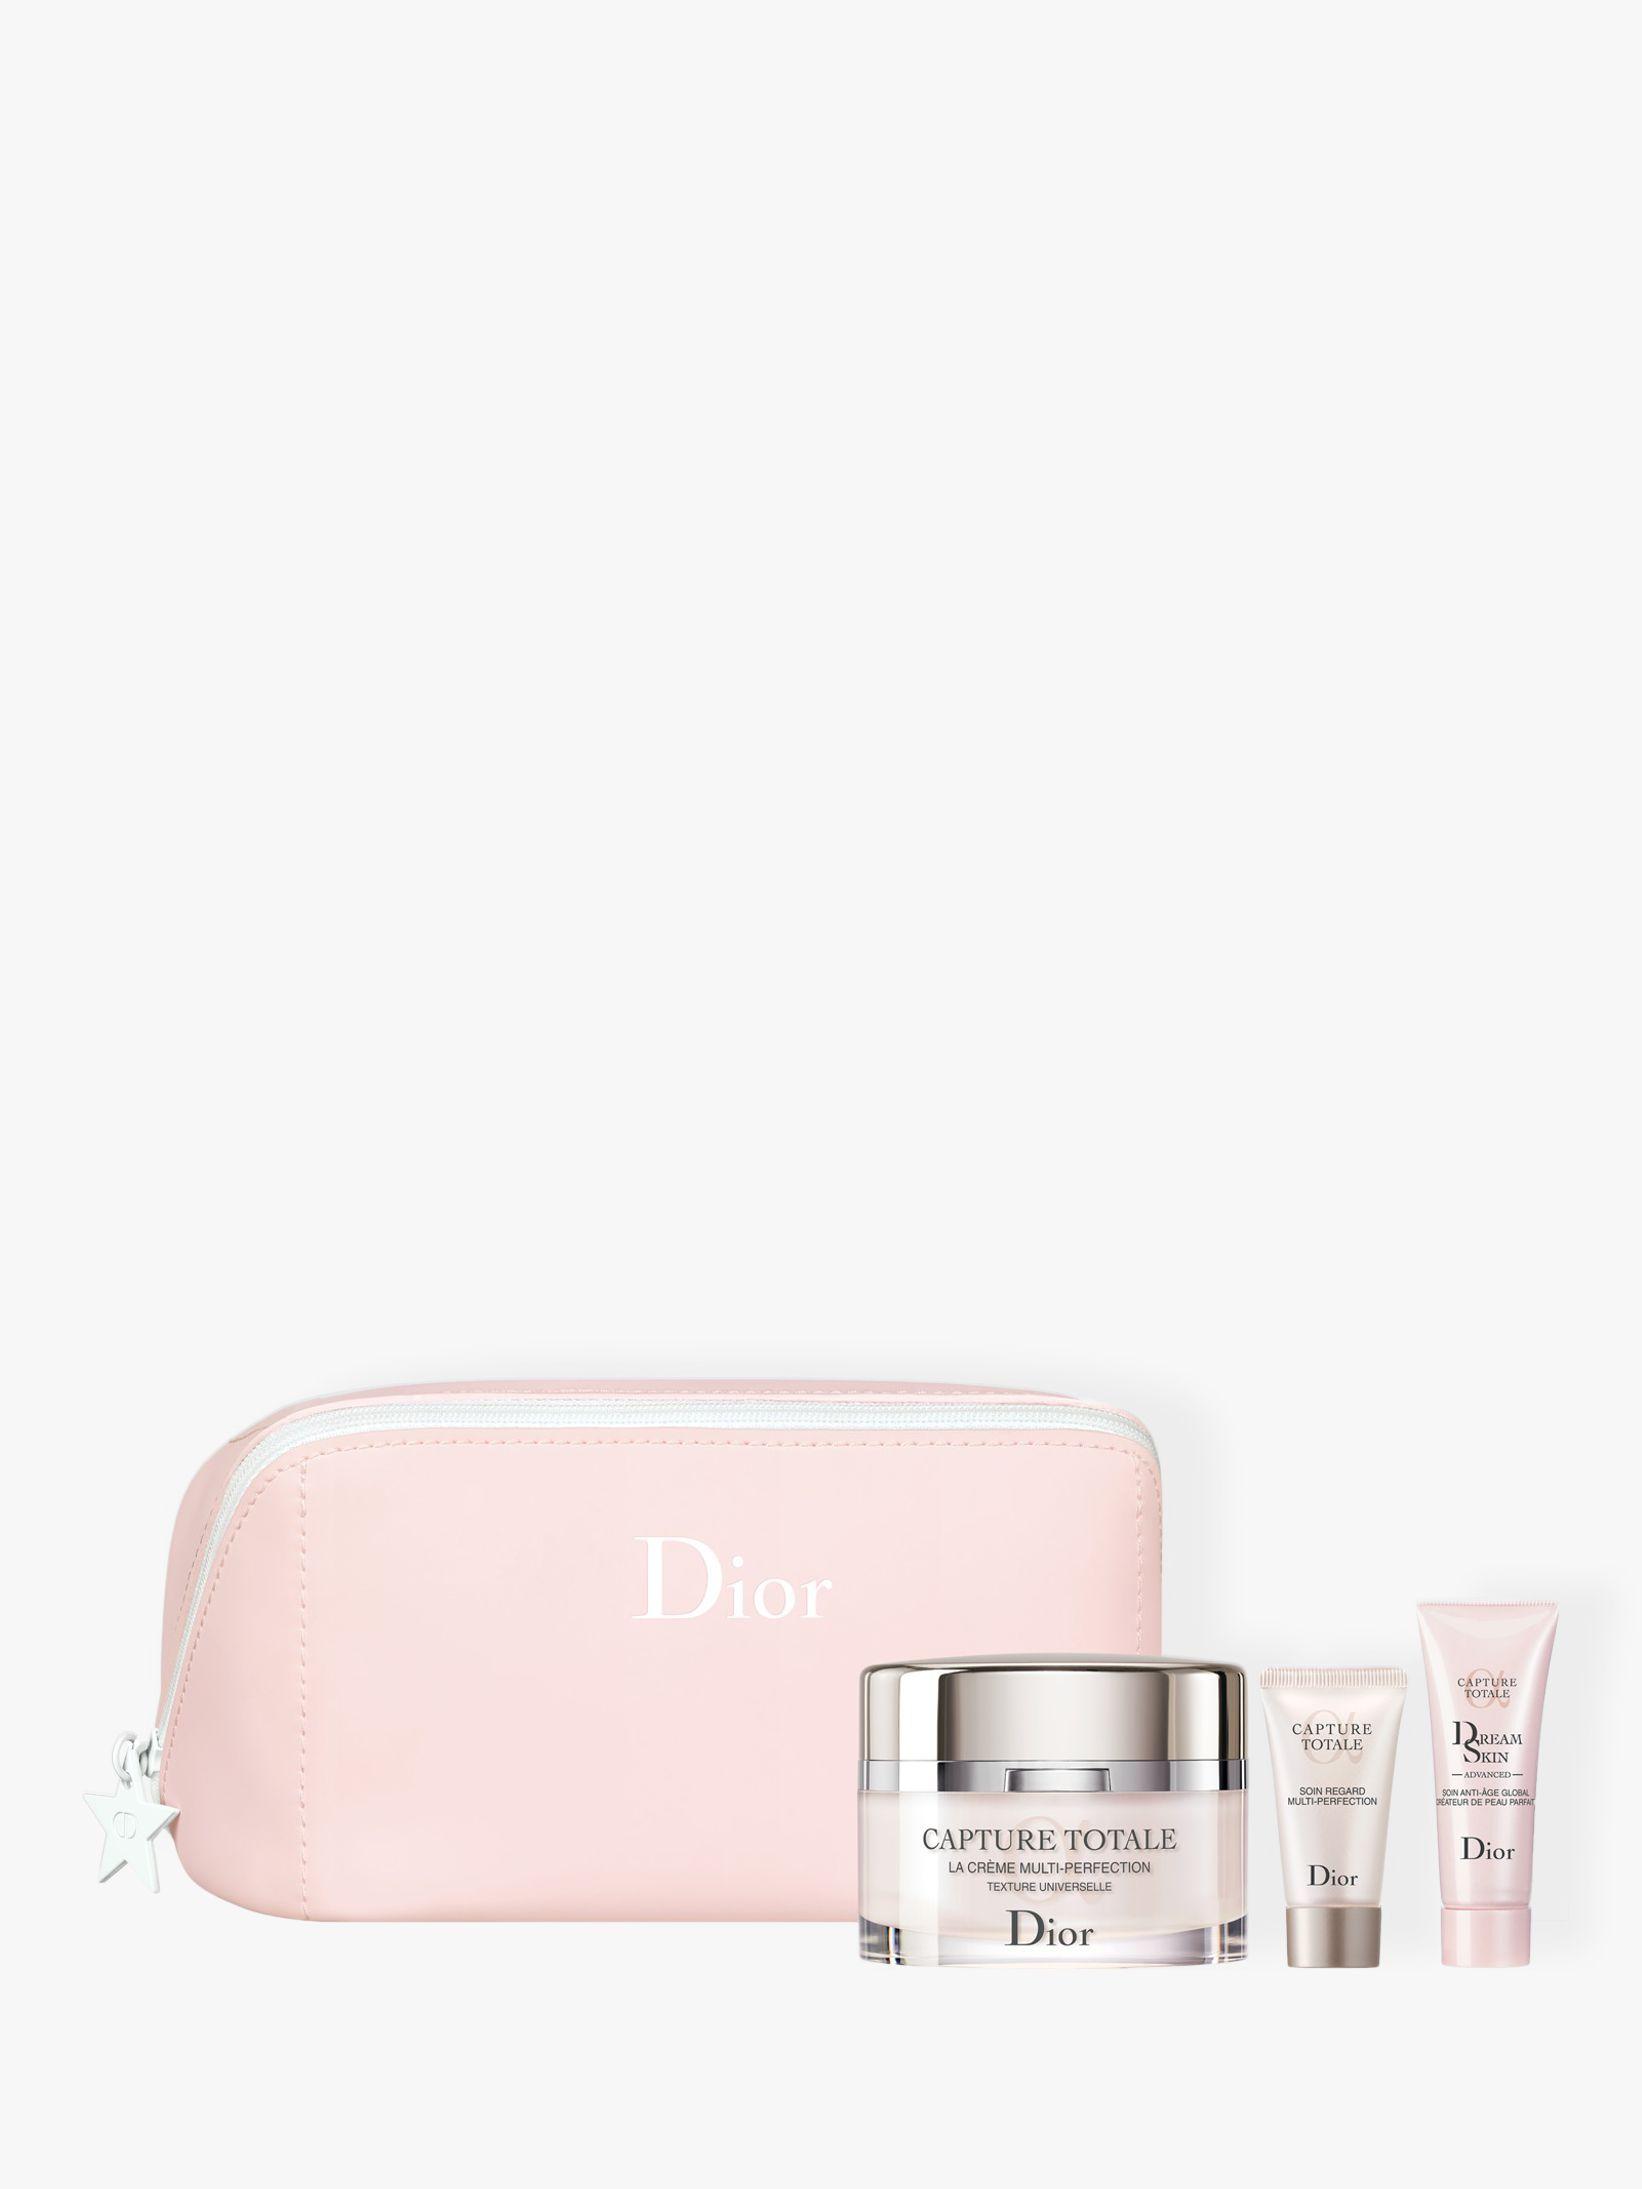 Dior capture totale skincare gift set skincare gift set